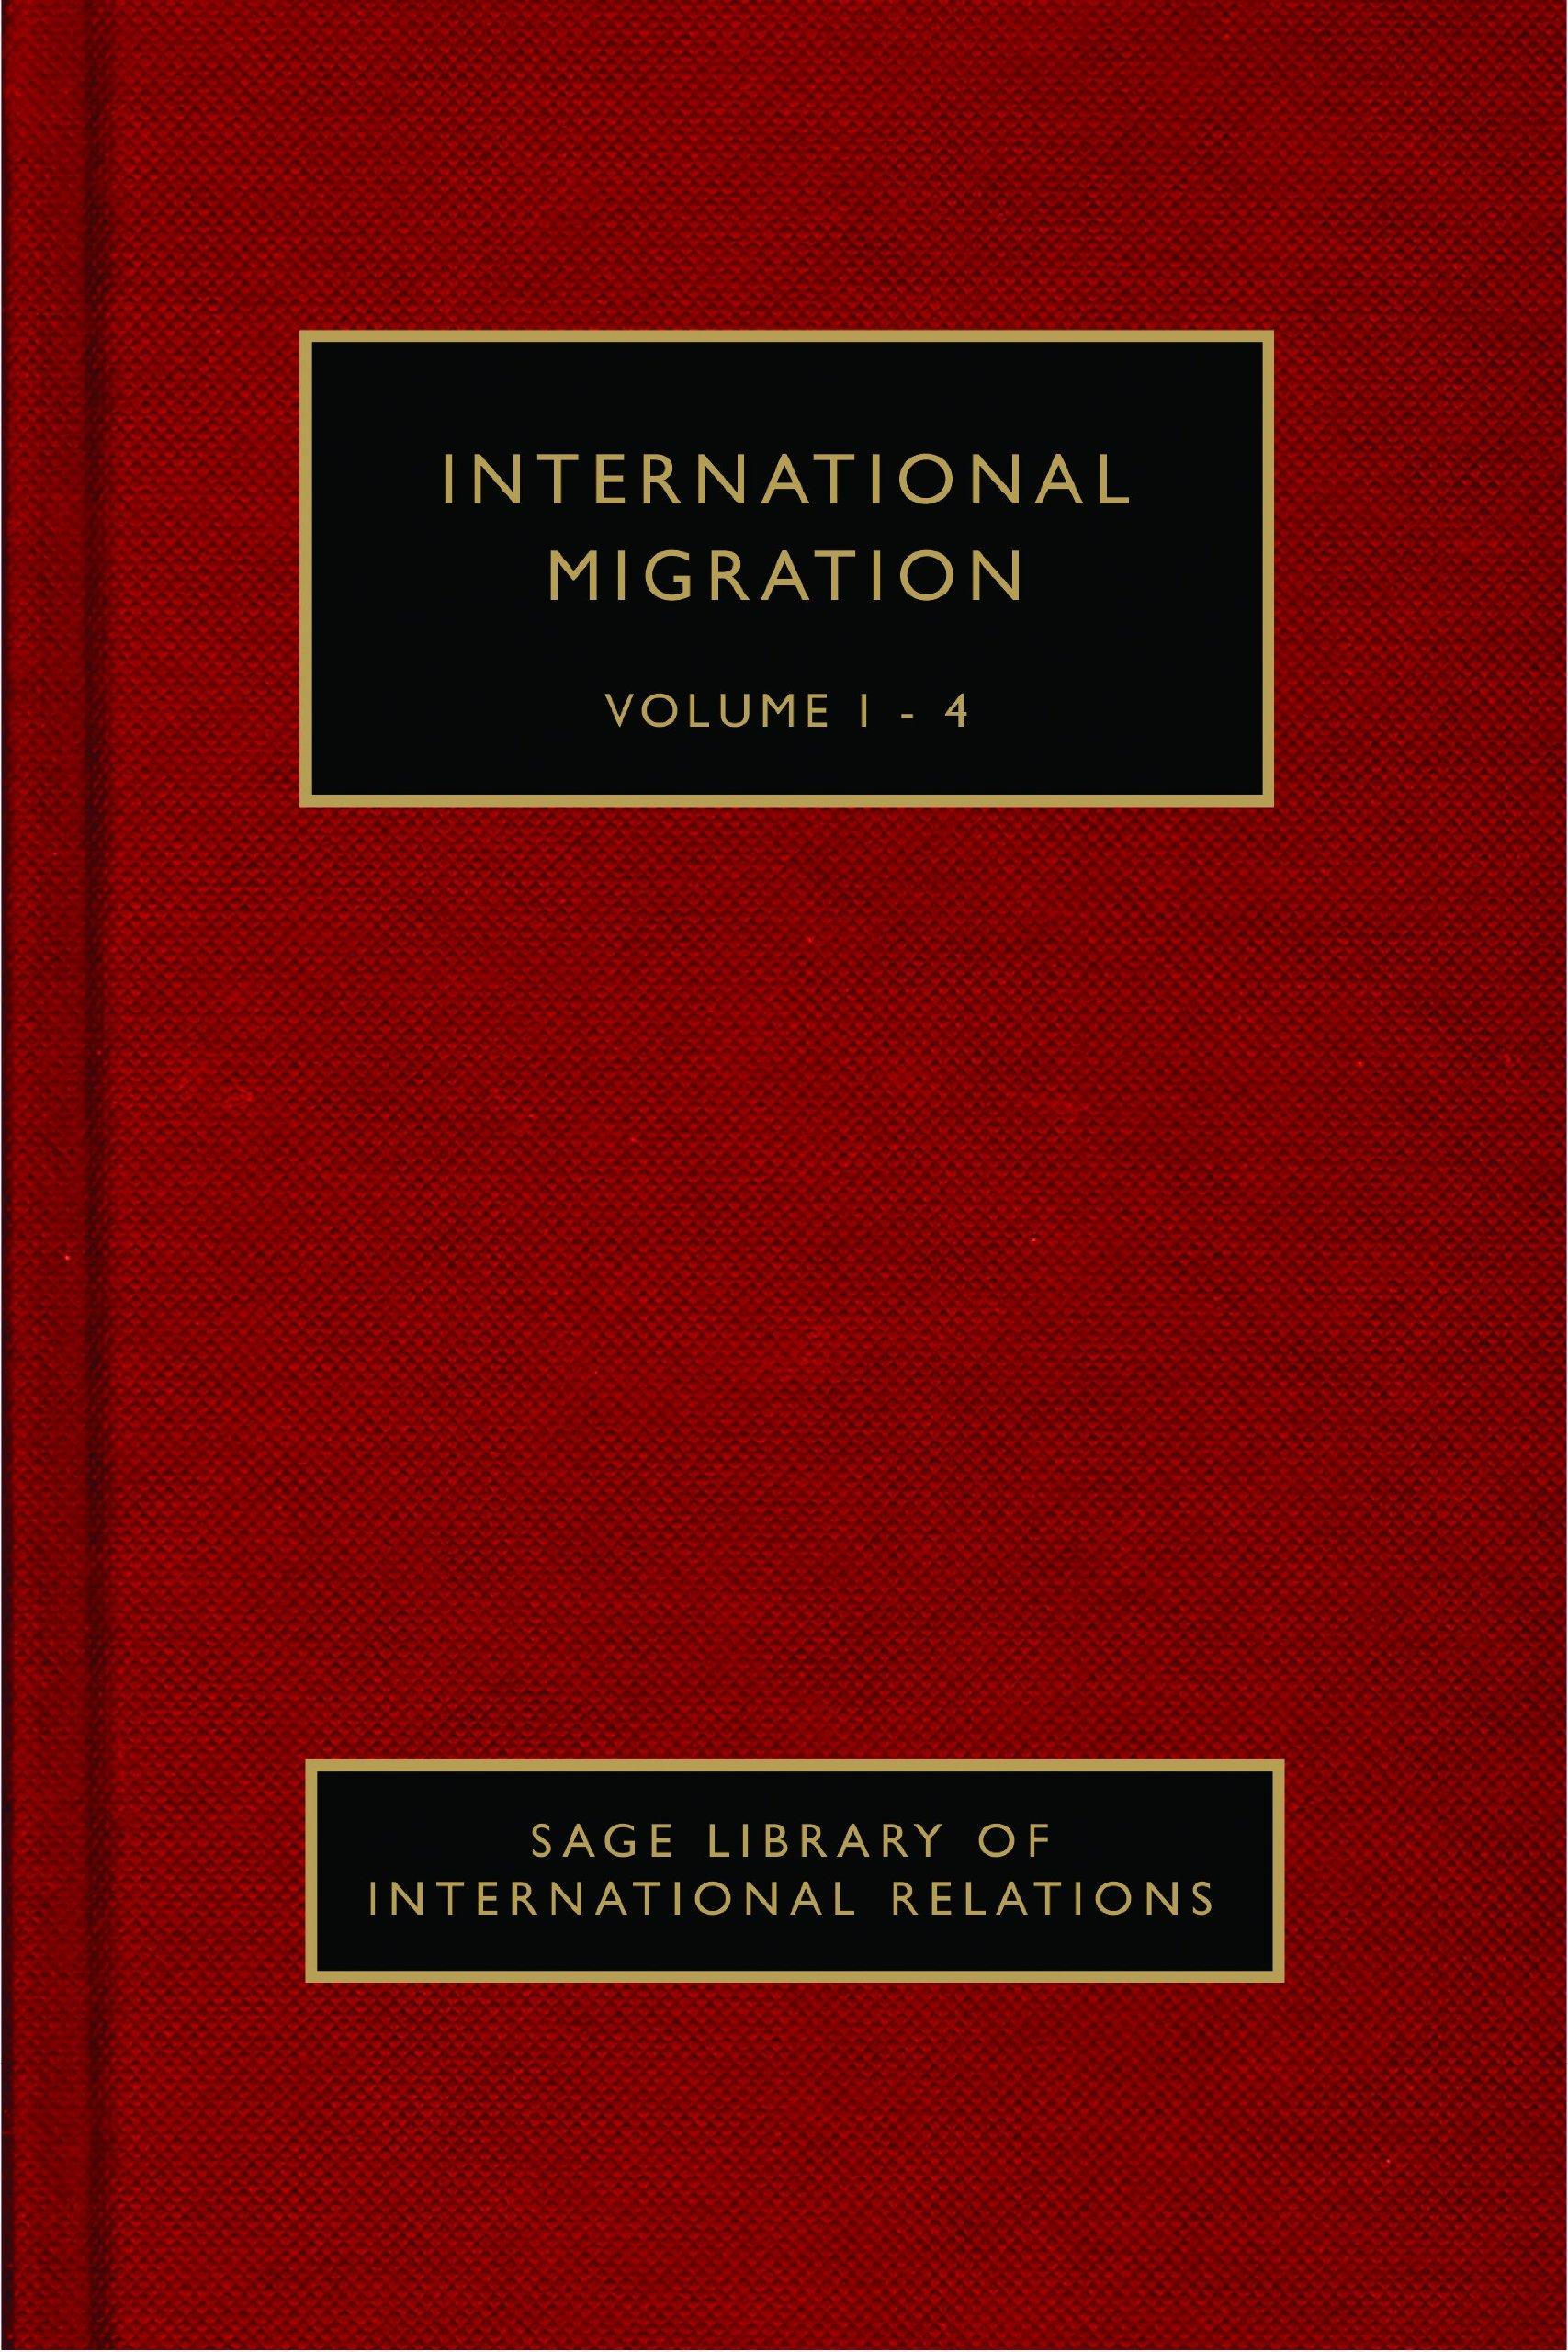 International Migration (SAGE Library of International Relations) pdf